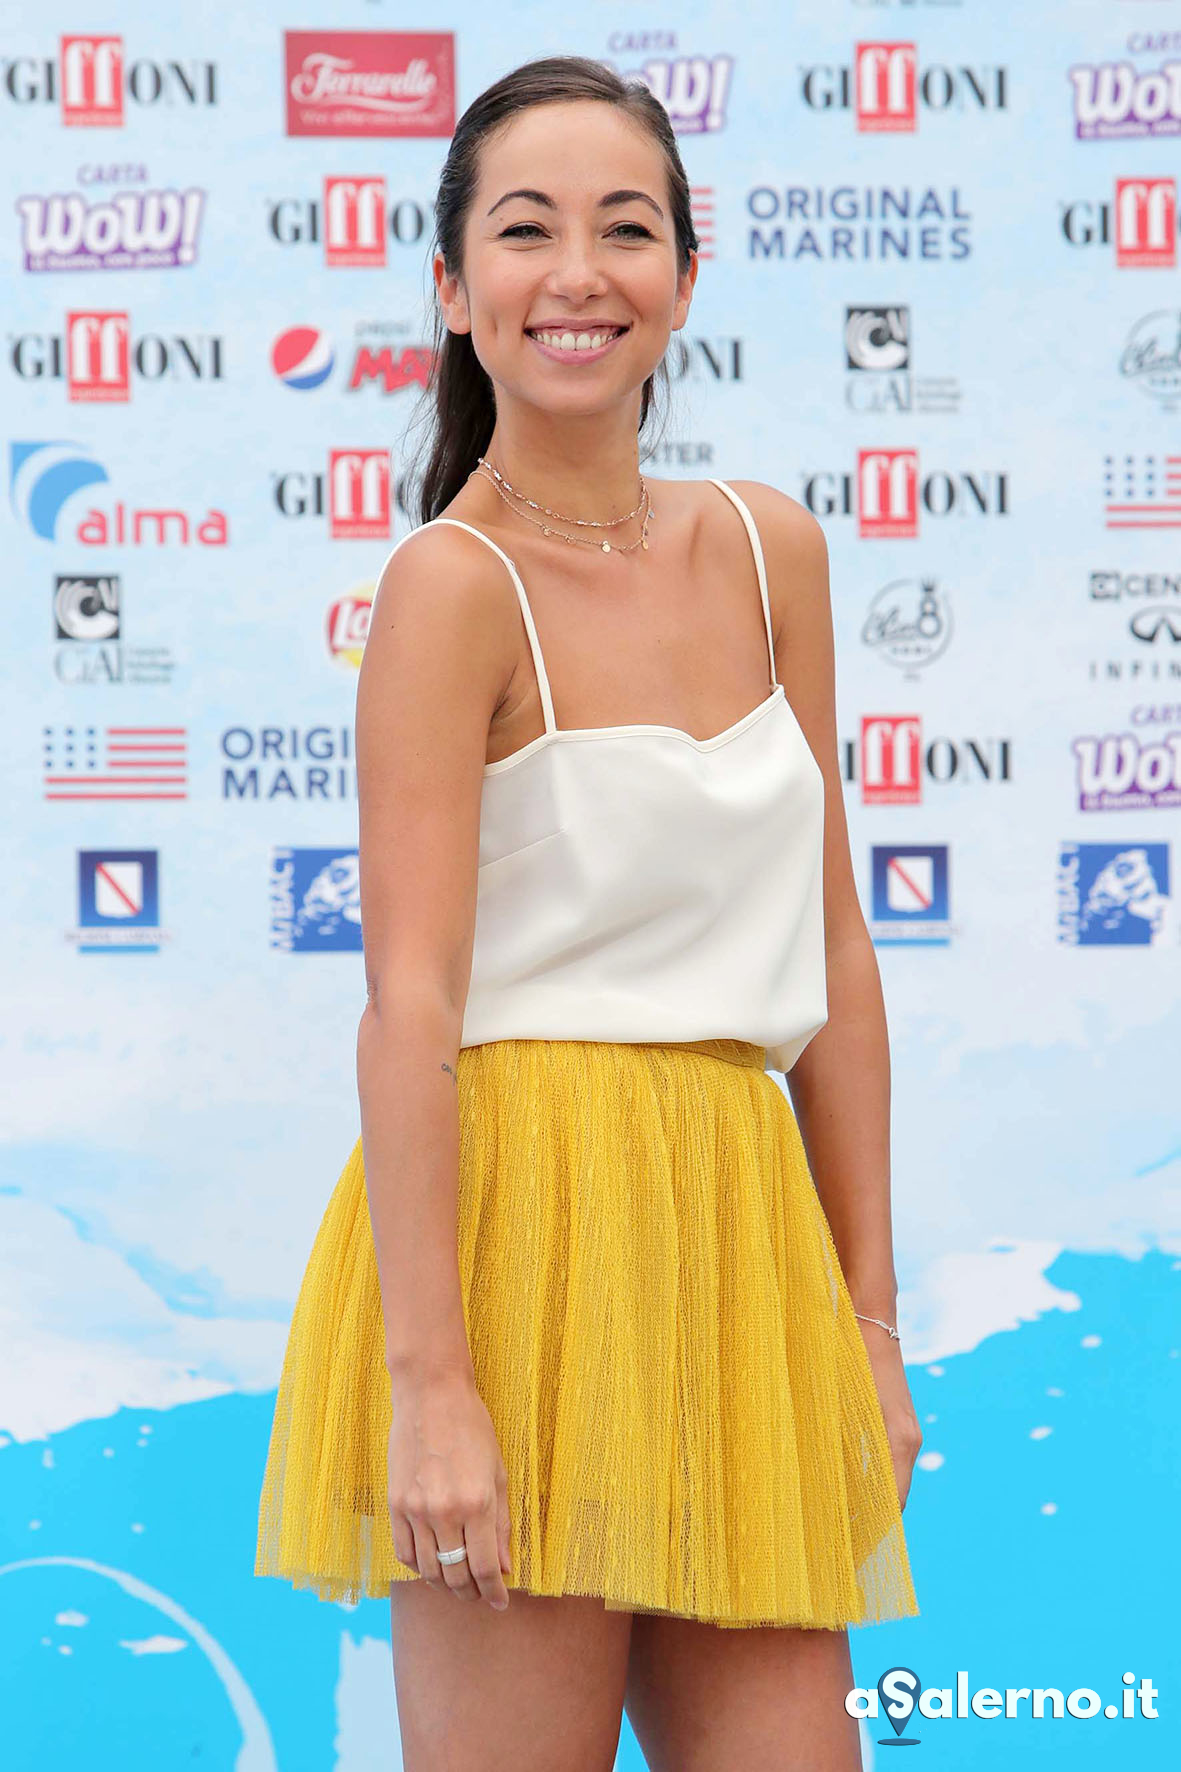 SAL - 23 07 2018 Giffoni Film Festival. Nella foto Tess Masazza. Foto Tanopress